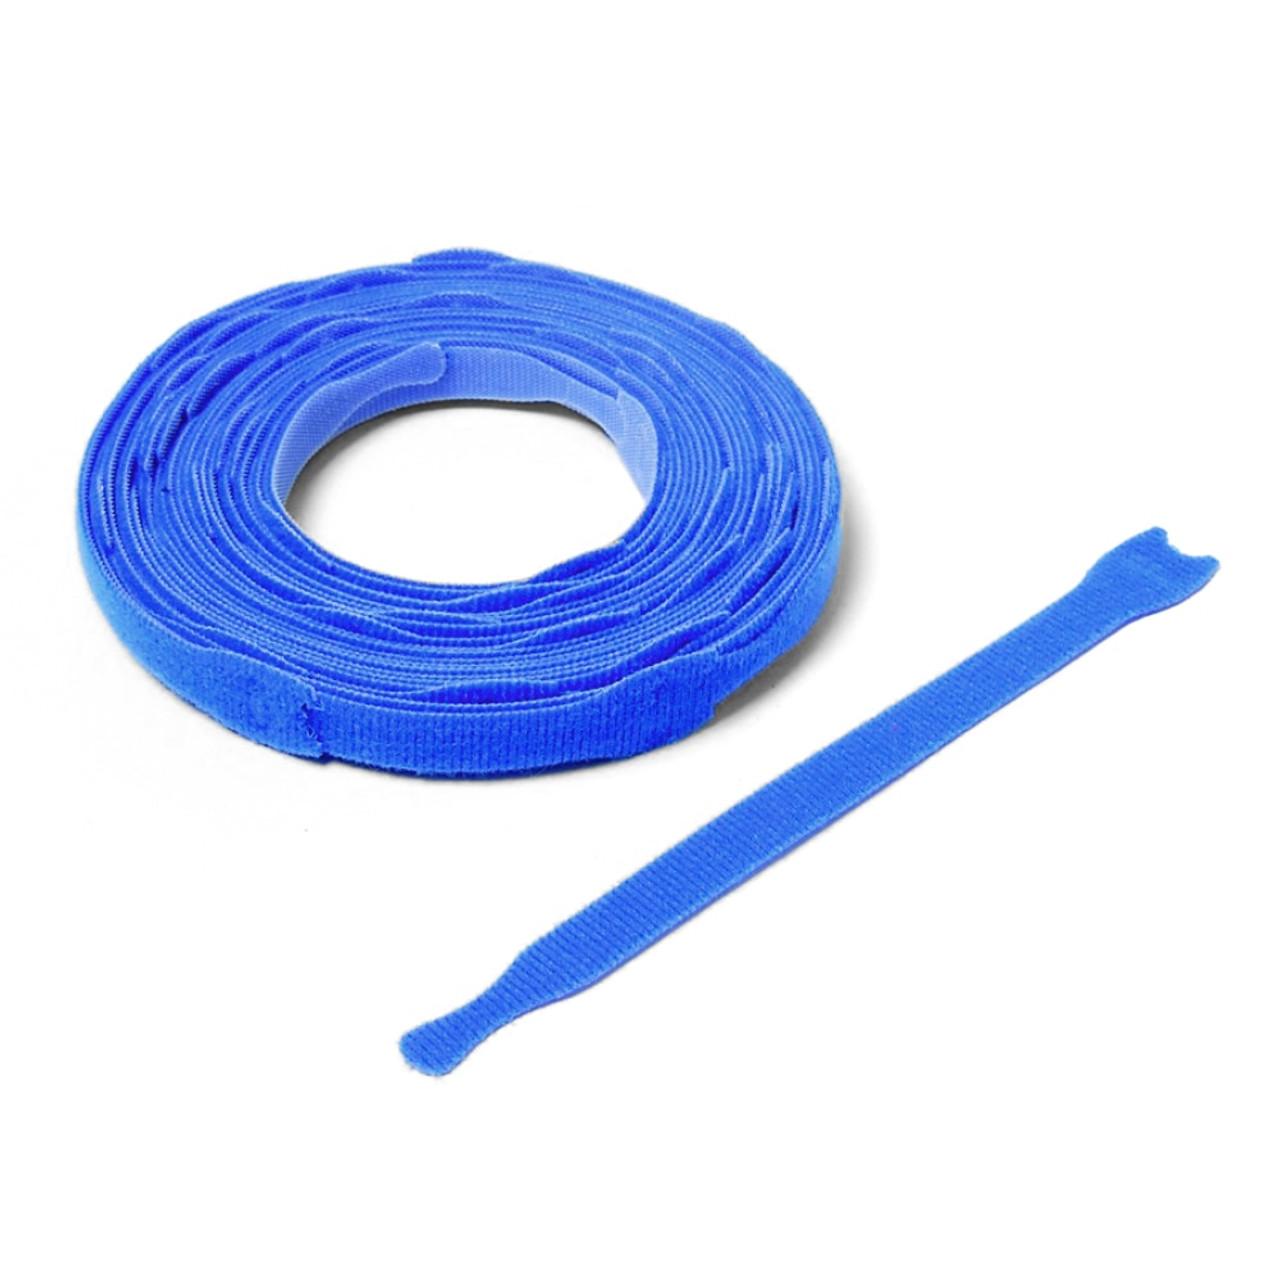 VELCRO ® Brand ONE-WRAP ® Die-Cut Straps - Blue / Velcro Straps - Bundling Straps - Velcro Tie - Velcro Strap